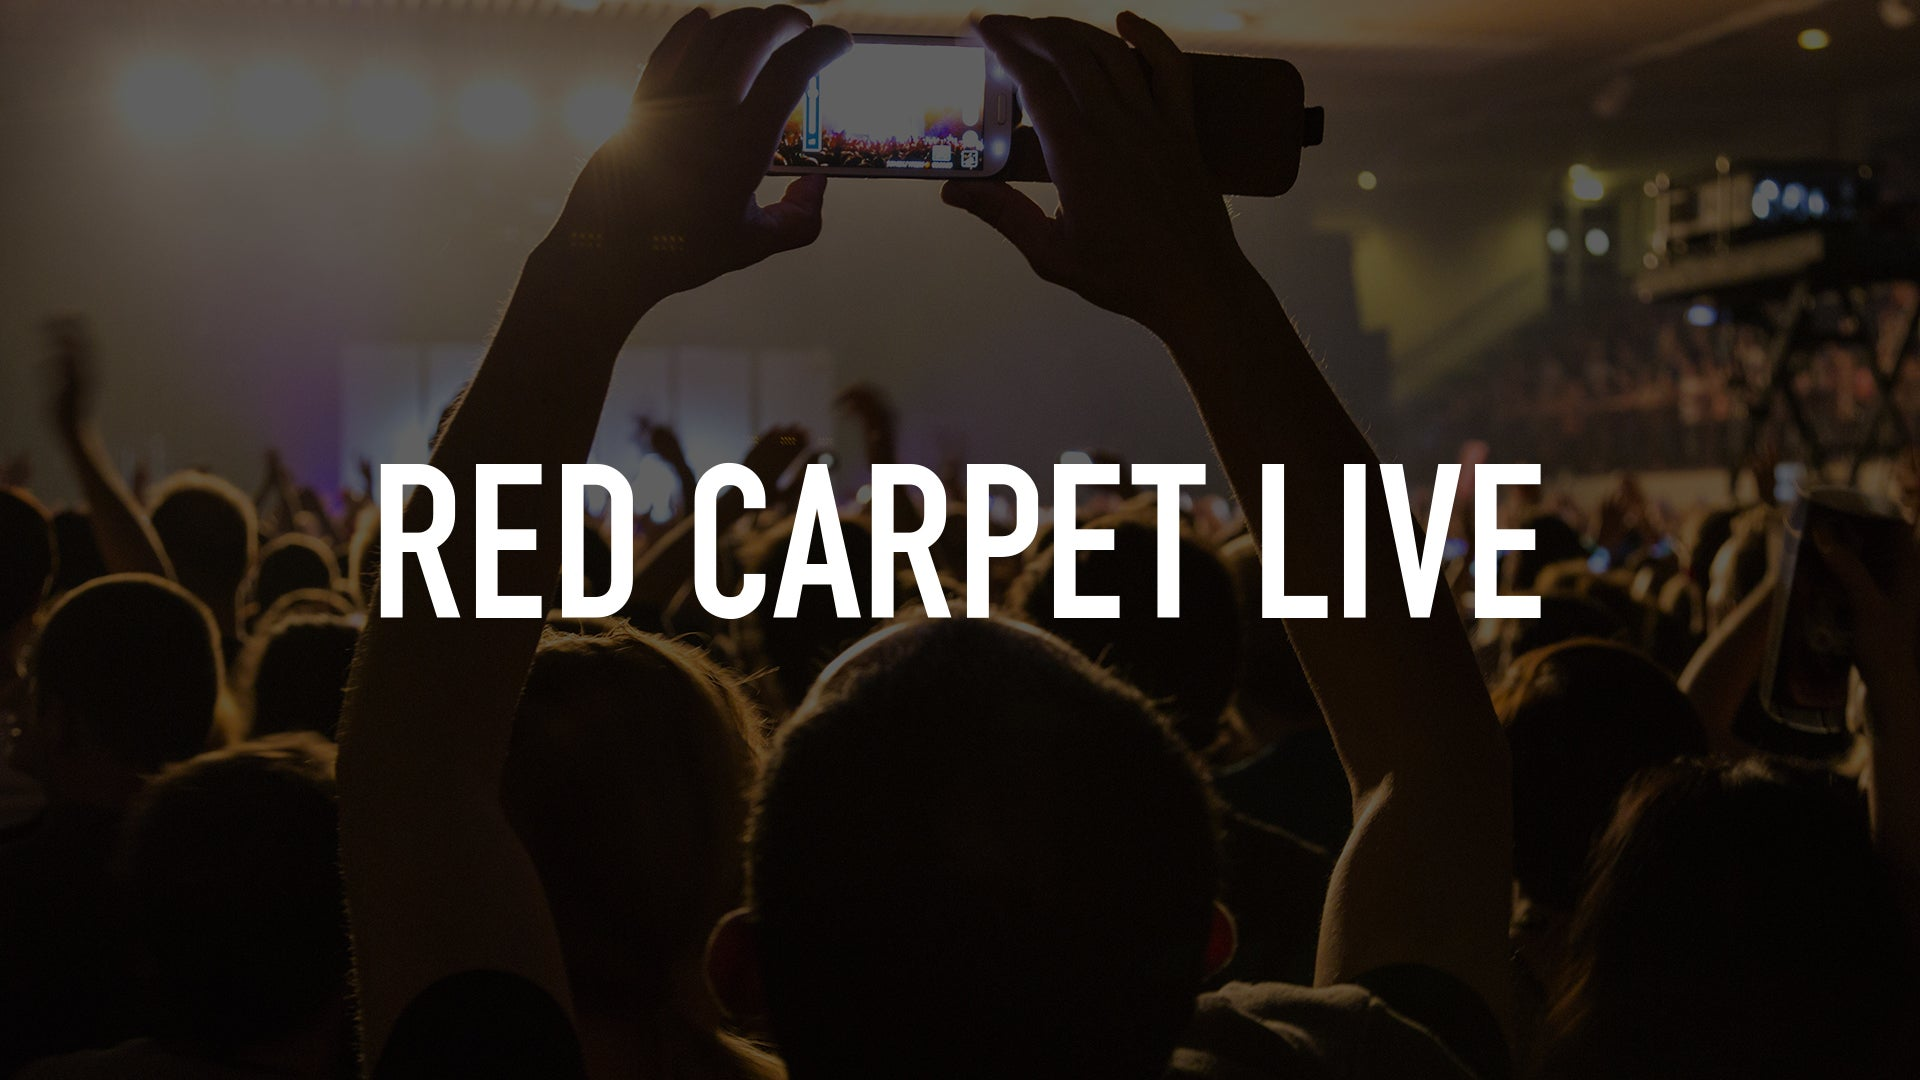 Red Carpet Live